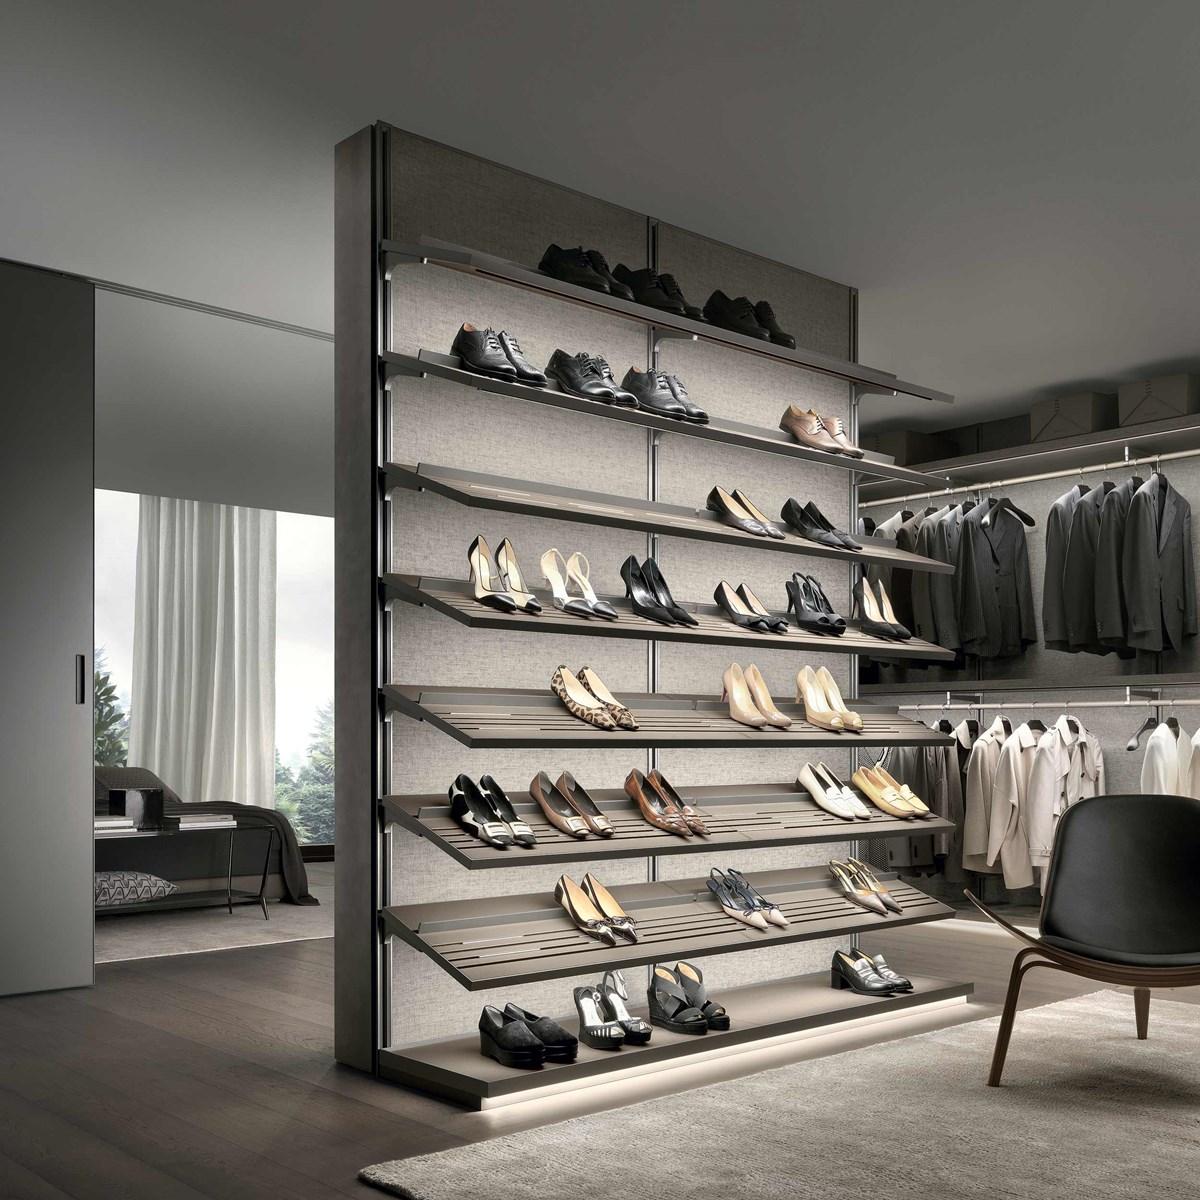 Rimadesio-Giuseppe-Bavuso-Dress-Bold-Wardrobe-Matisse-3